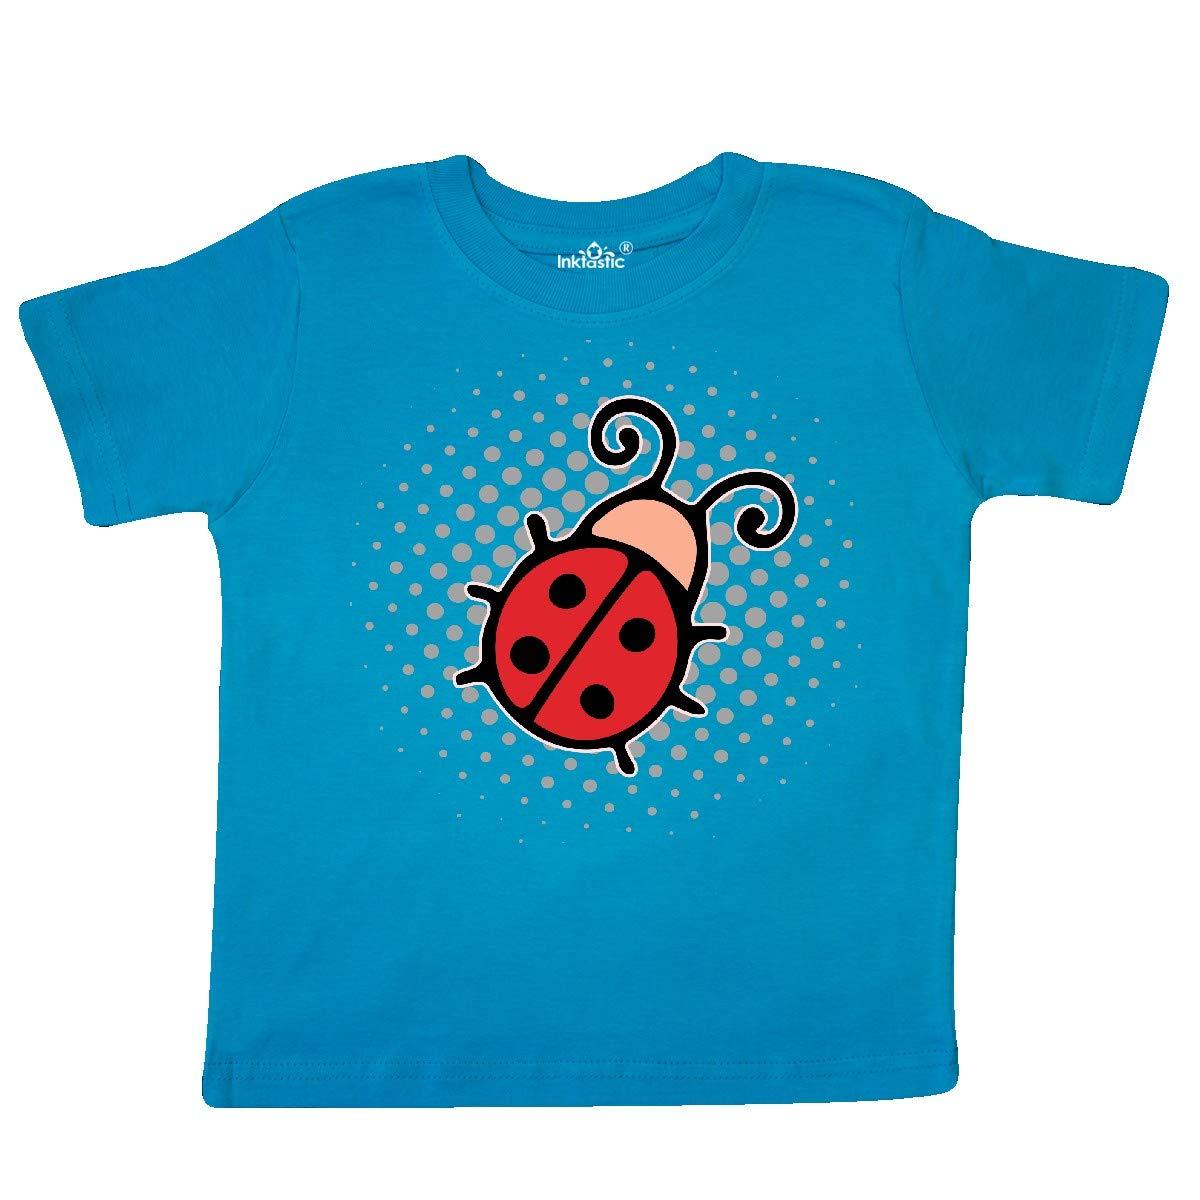 inktastic Ladybug Lover Toddler T-Shirt